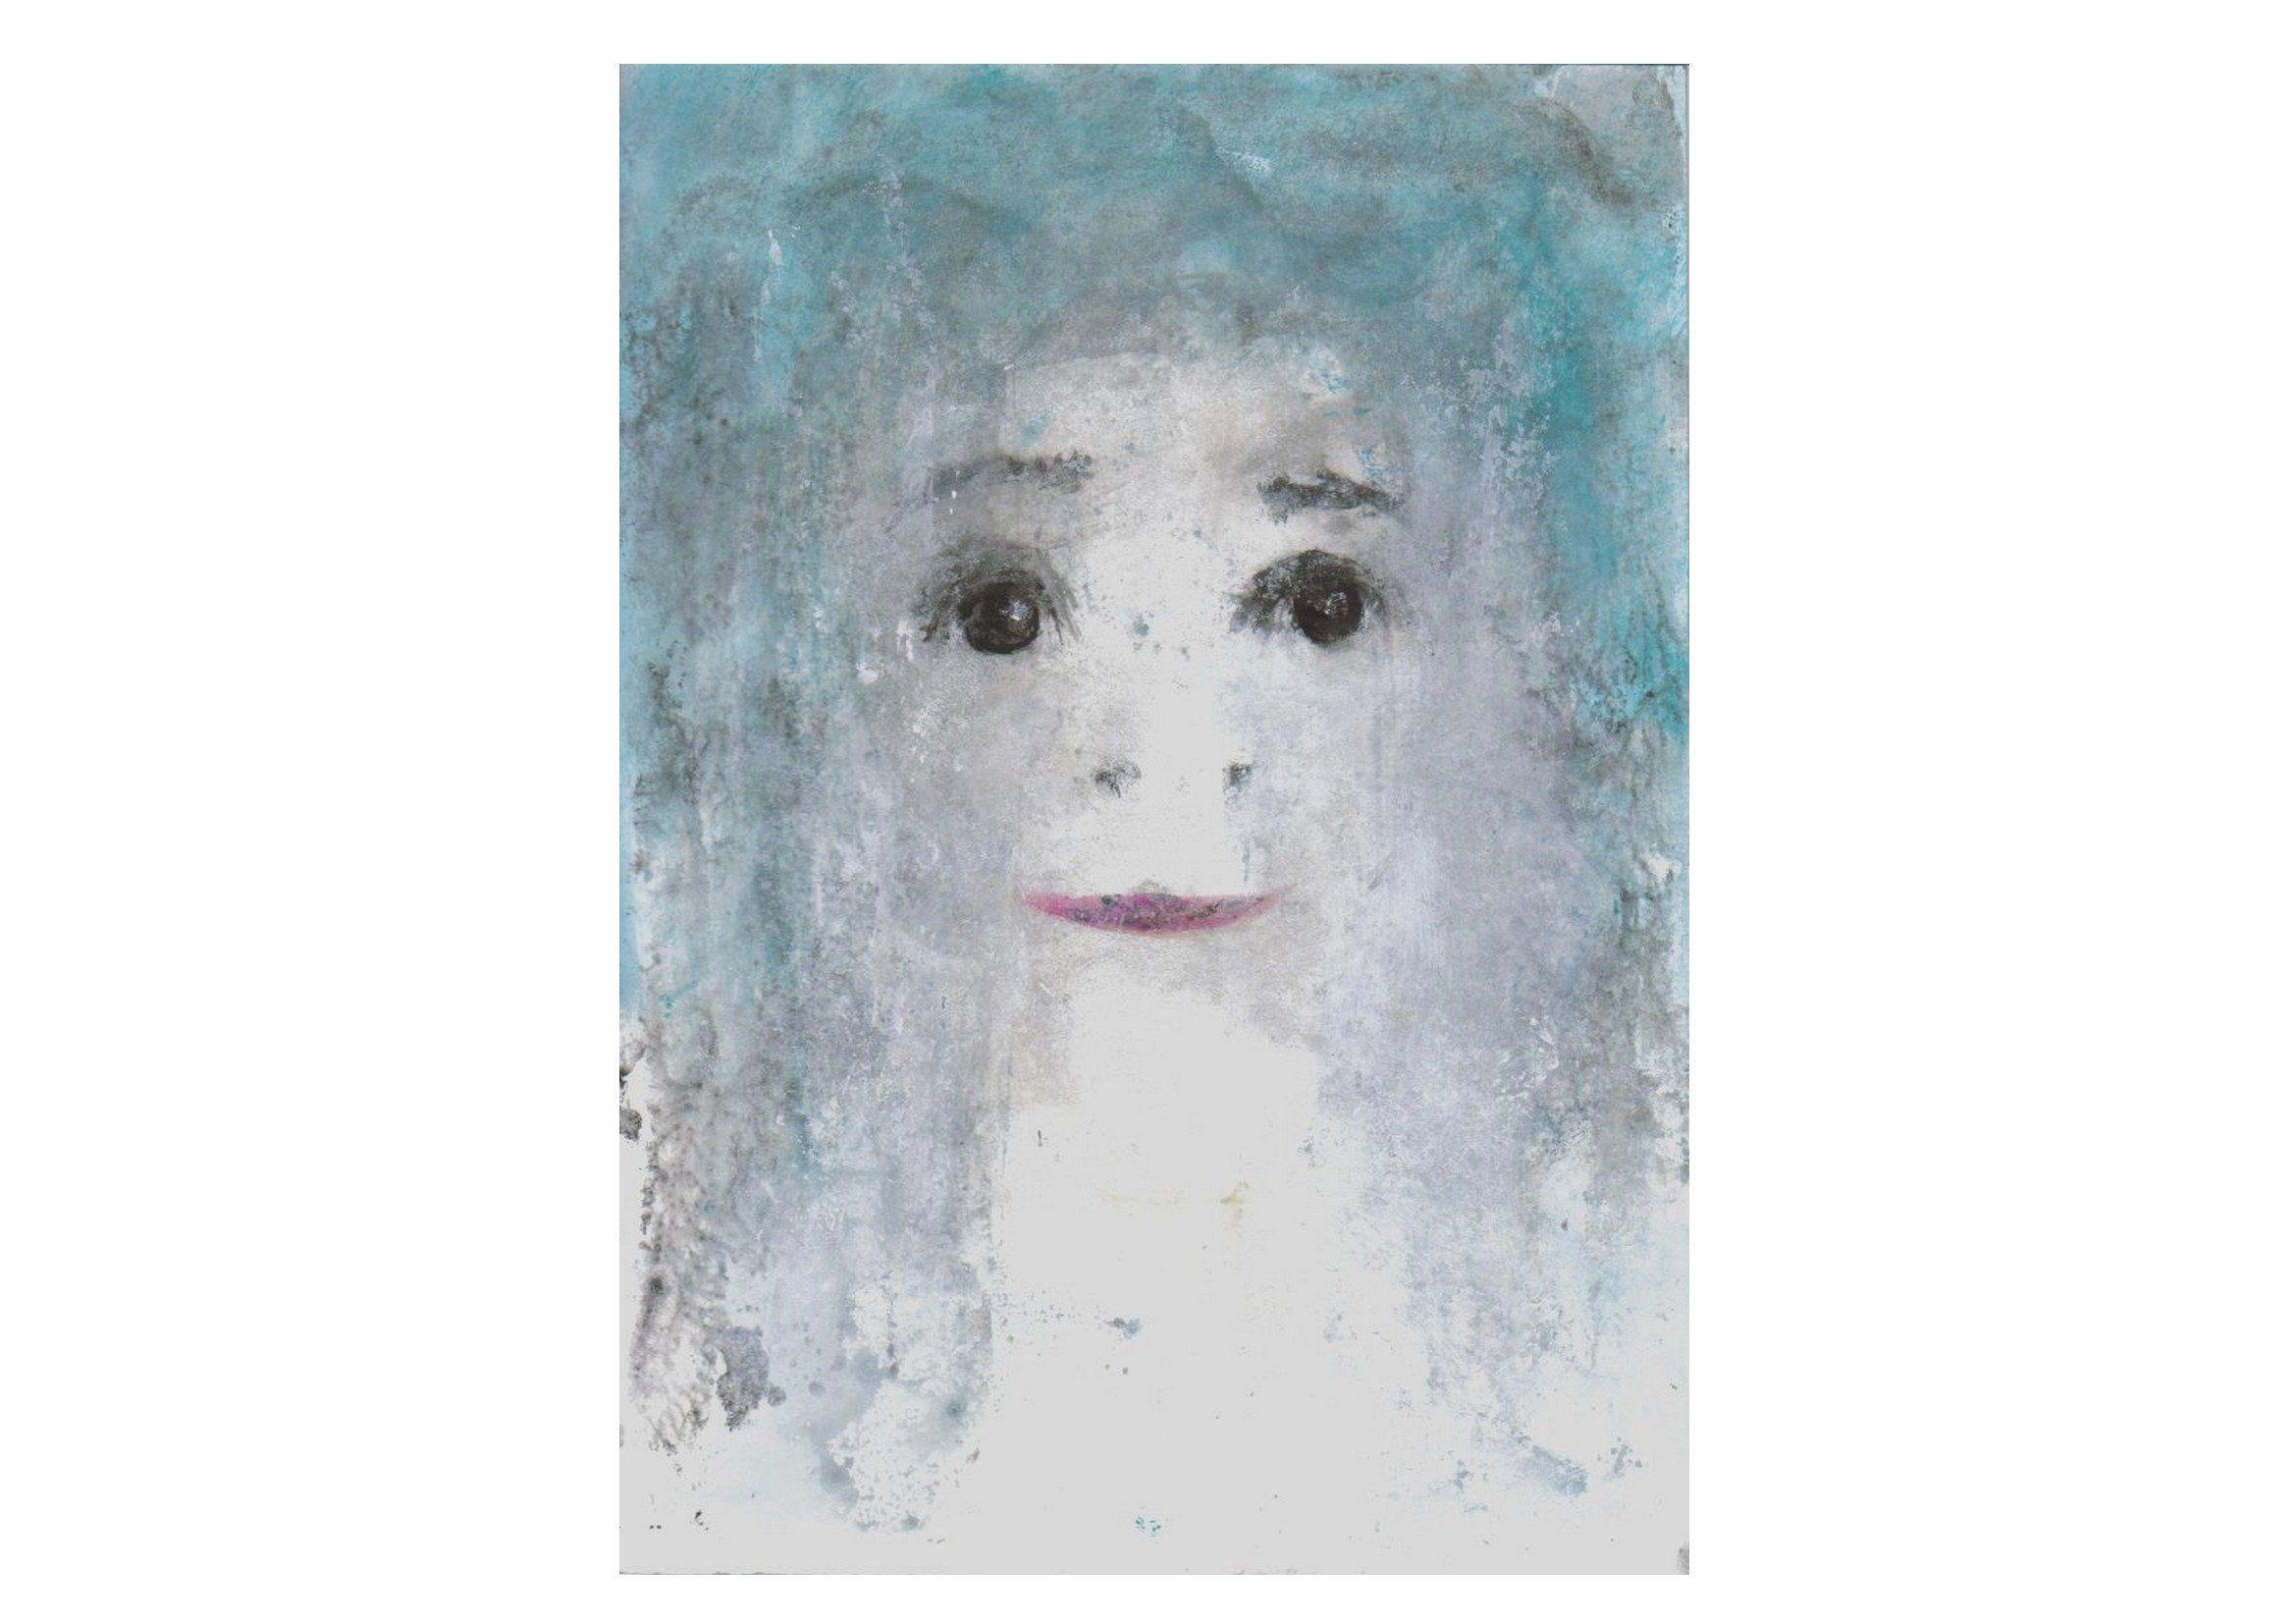 Portrait peinture femme fille bleu blanc gris visage moderne